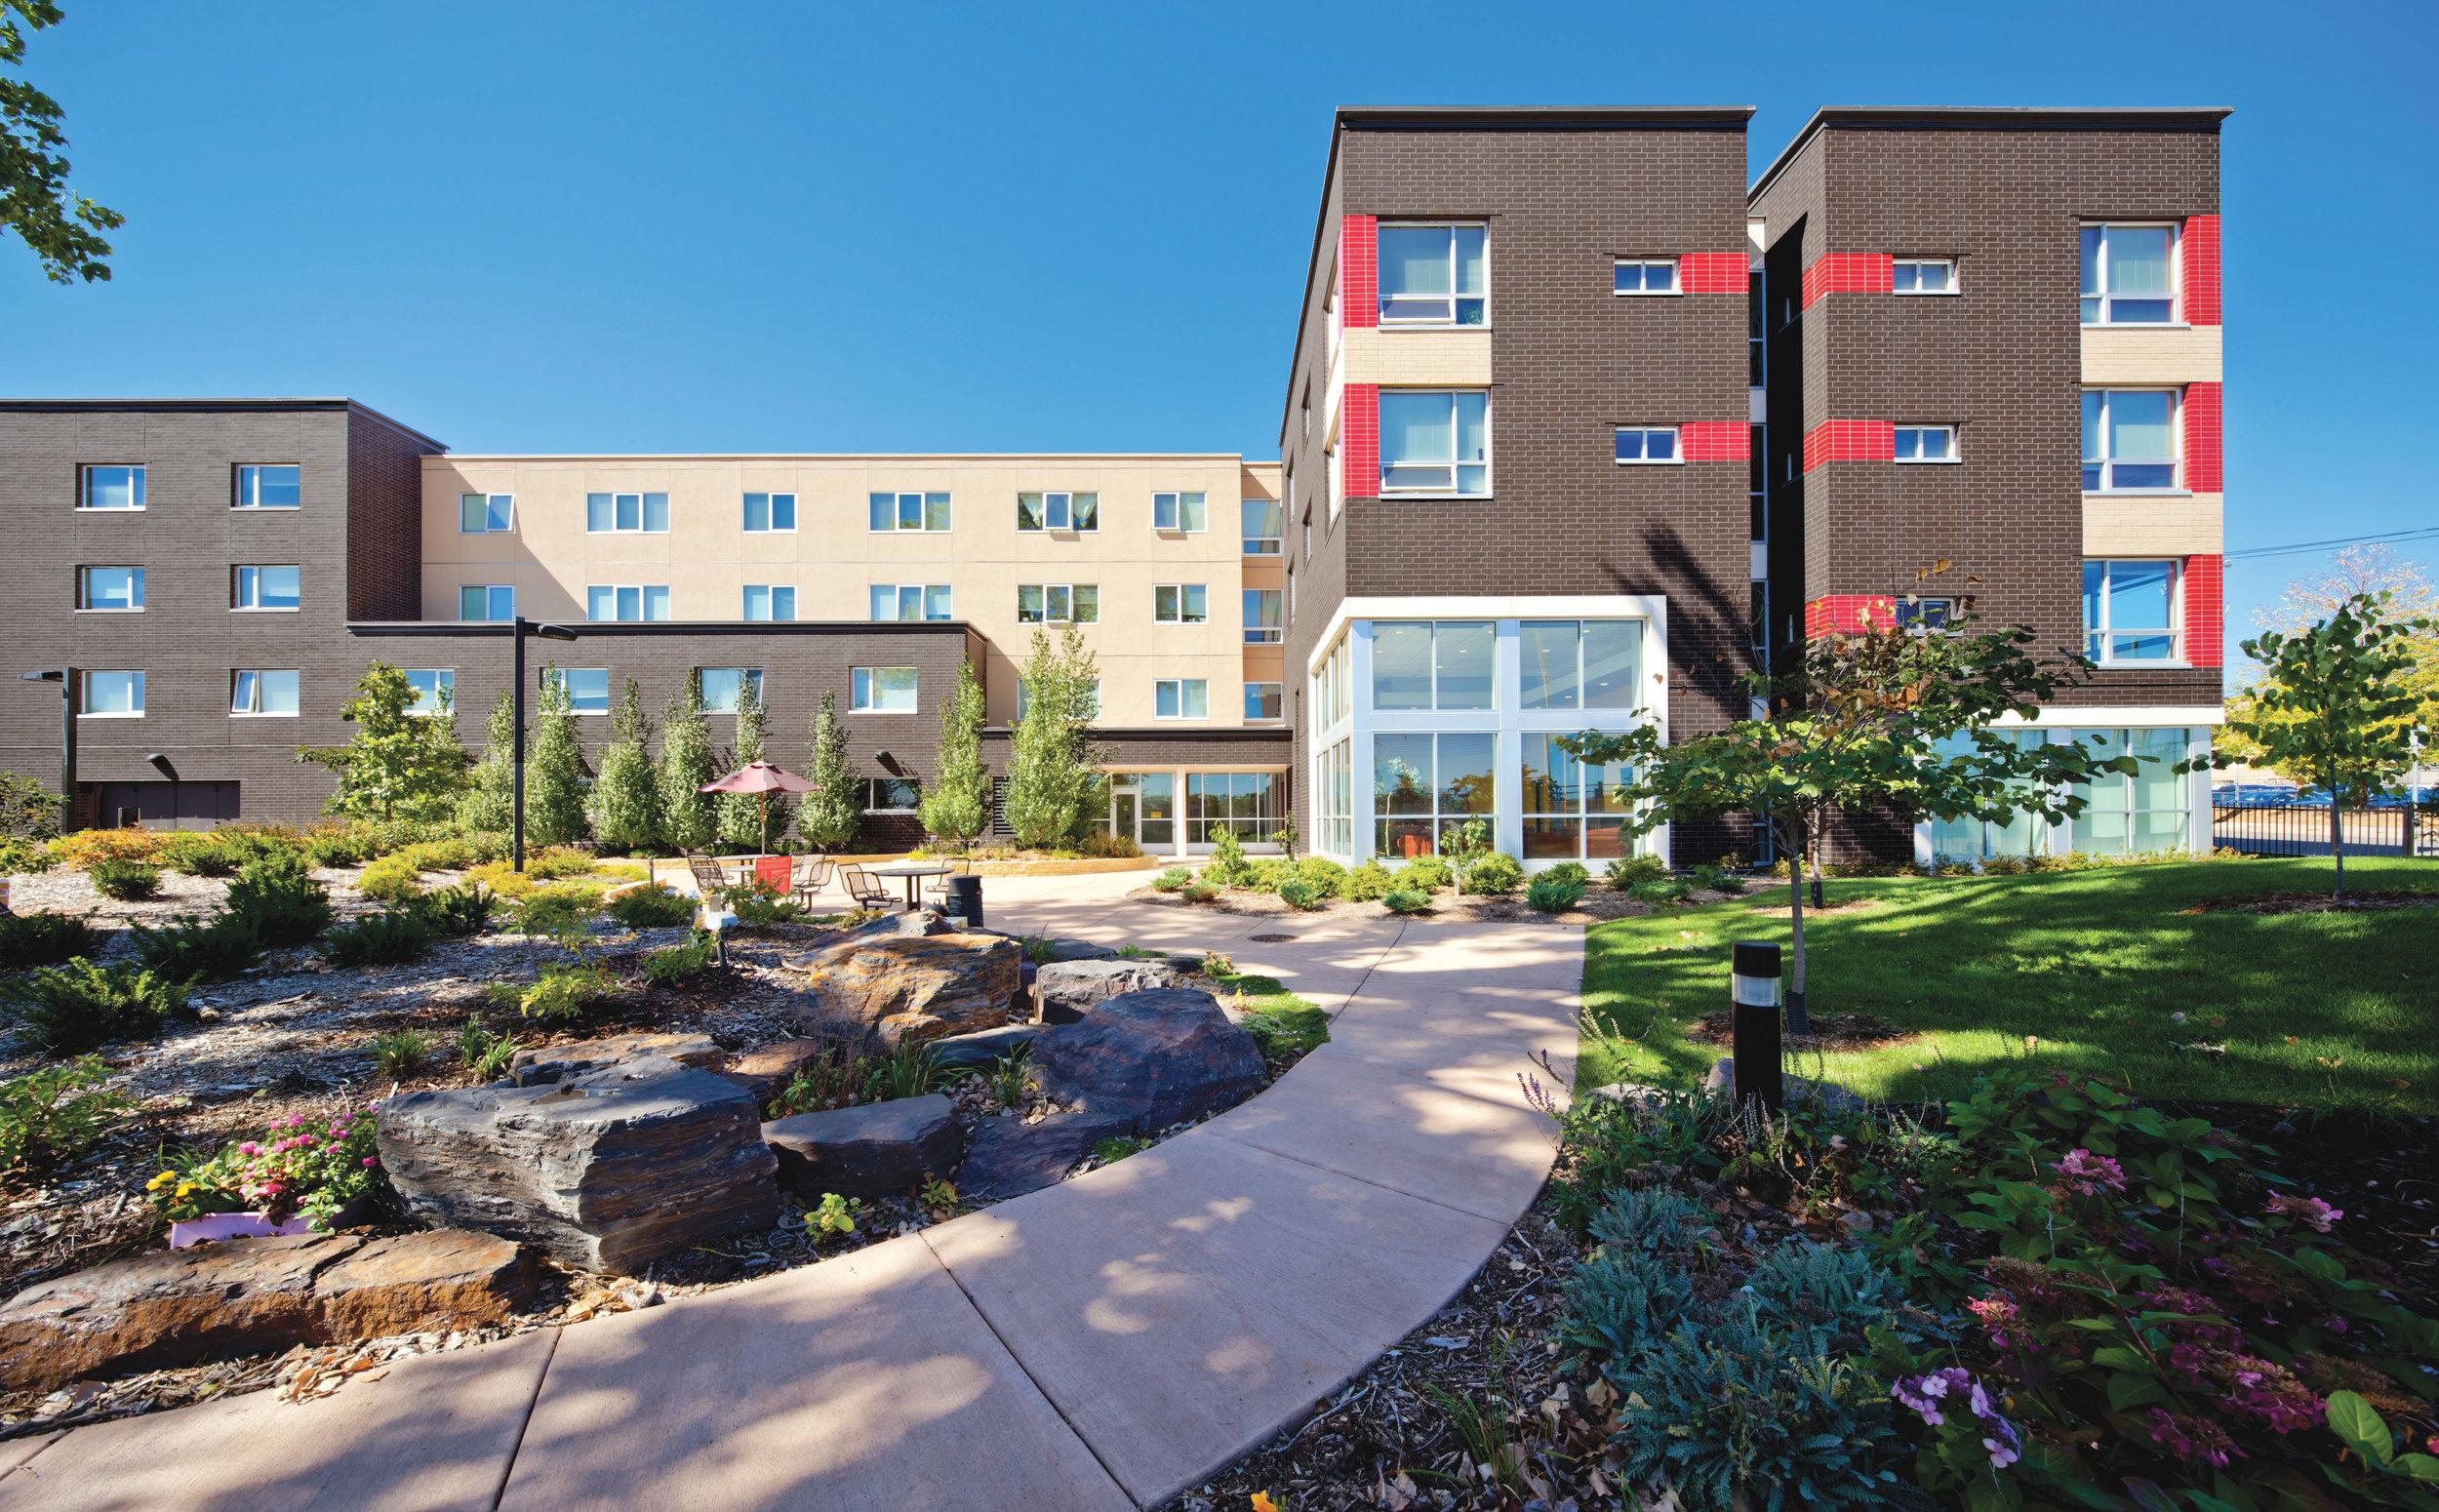 0747-ext-courtyard-west-elevation-horiz-ET.jpg